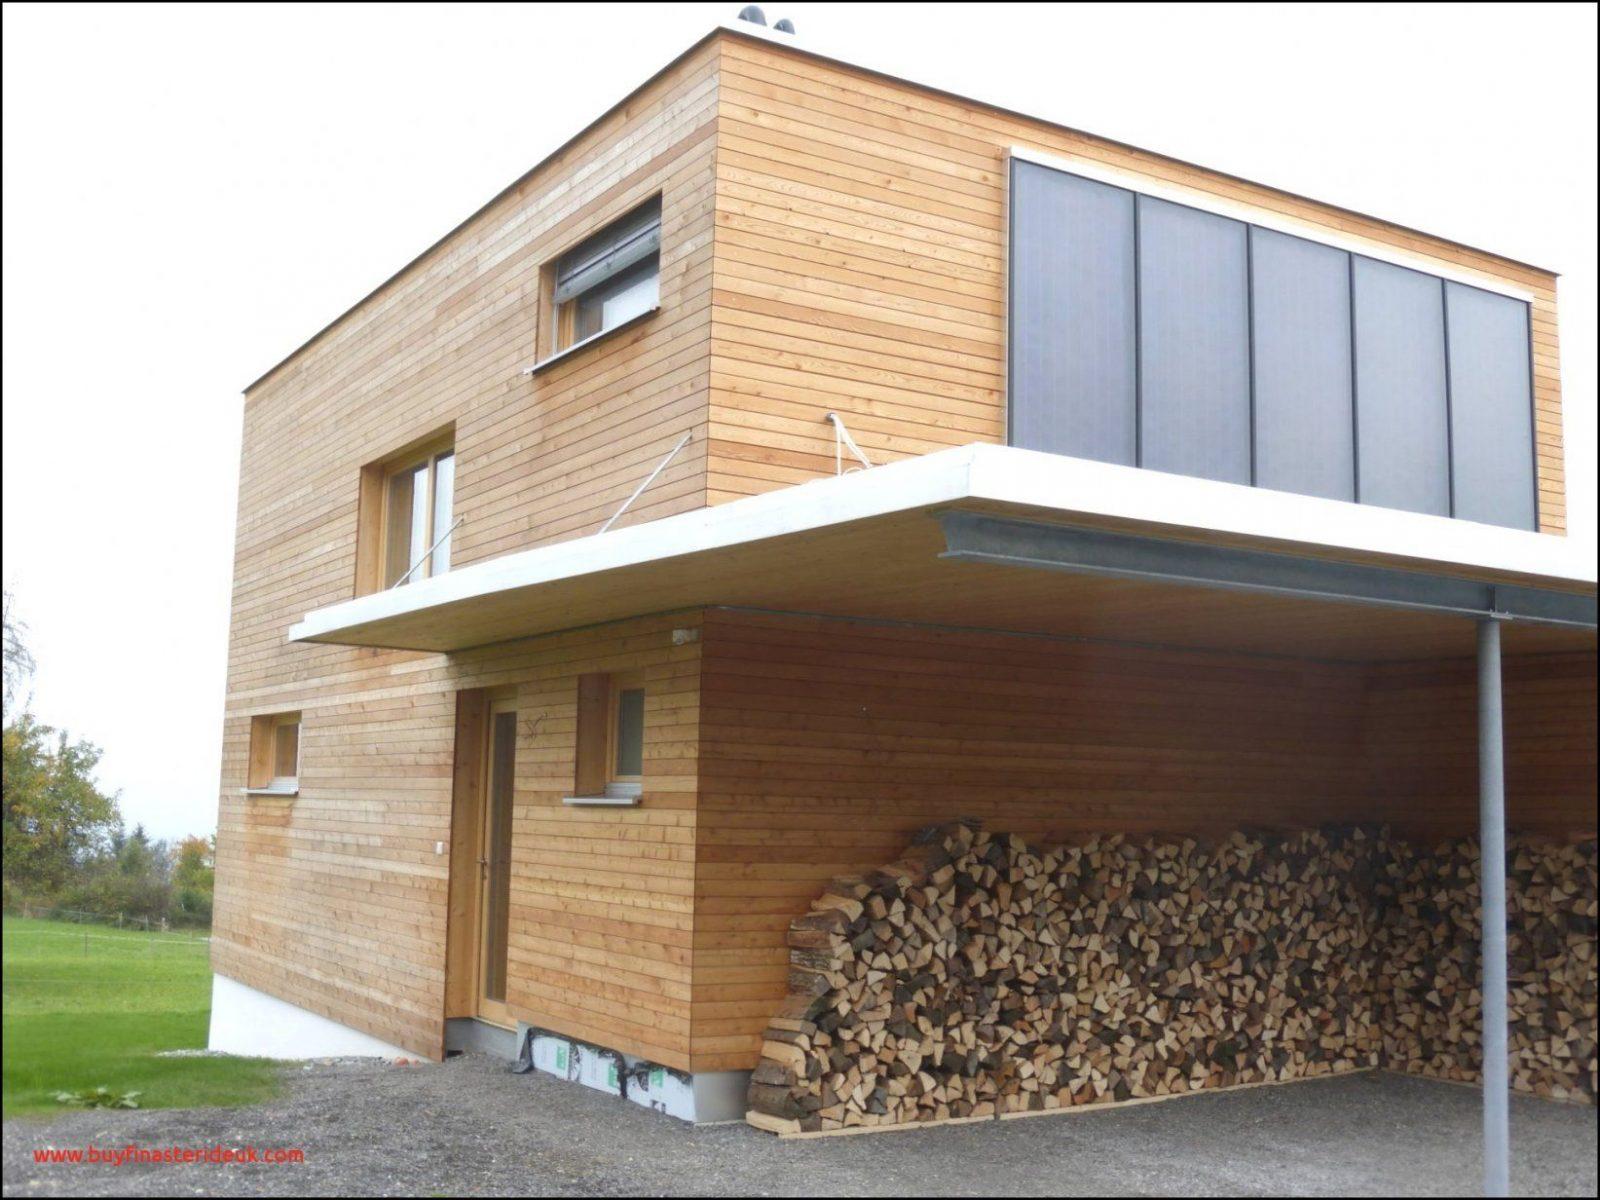 Haus Komplett Selber Bauen | Haus Design Ideen